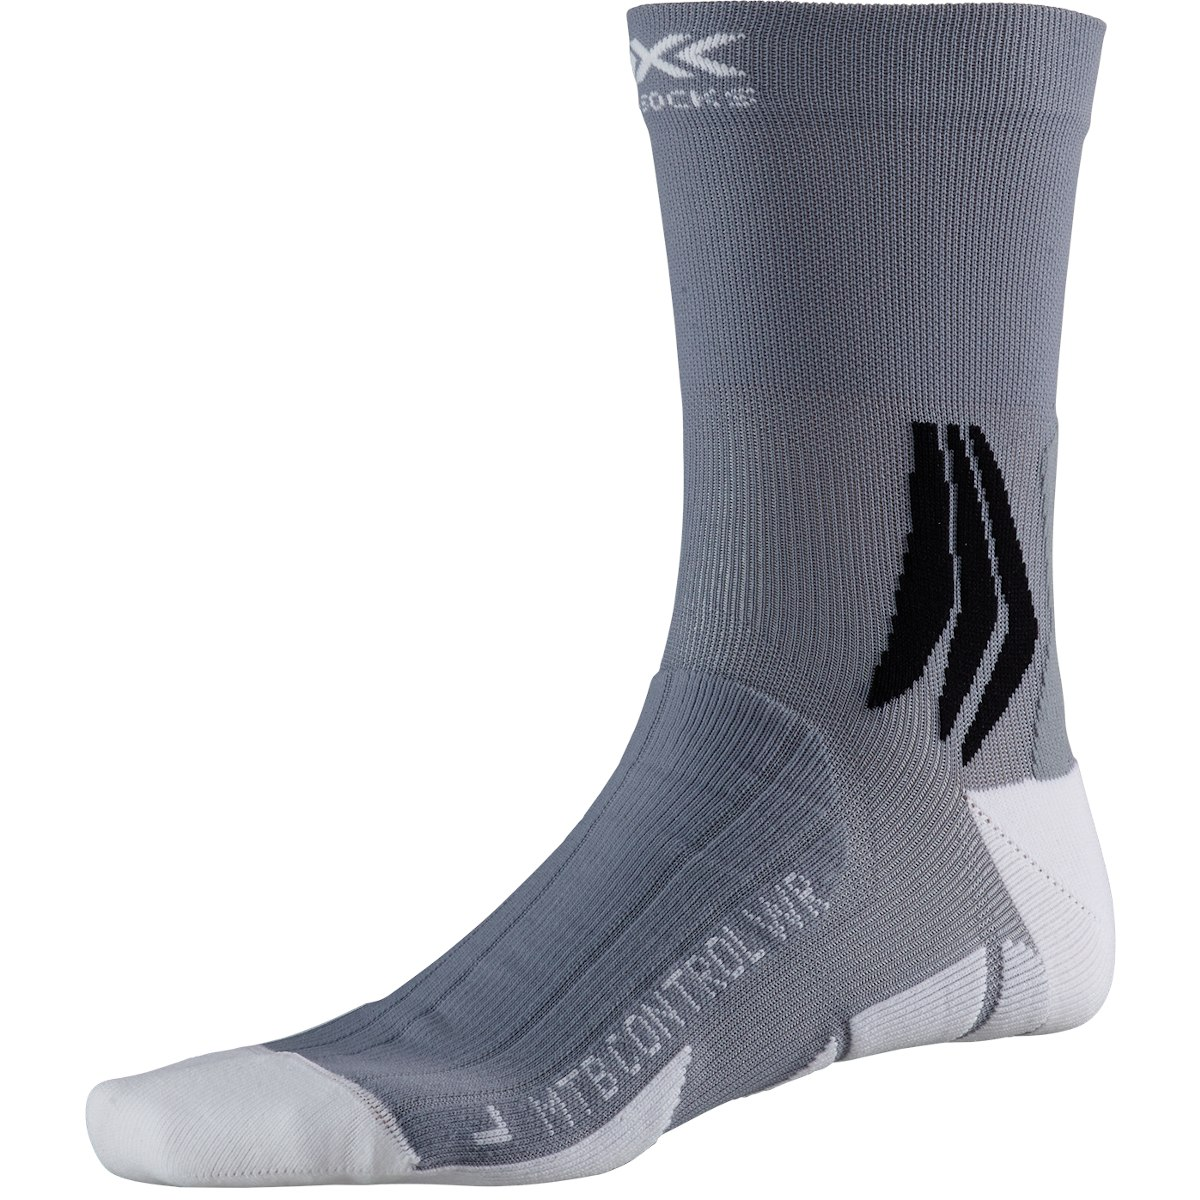 X-Socks MTB Control WR Biking Socken - arctic white/dolomite grey